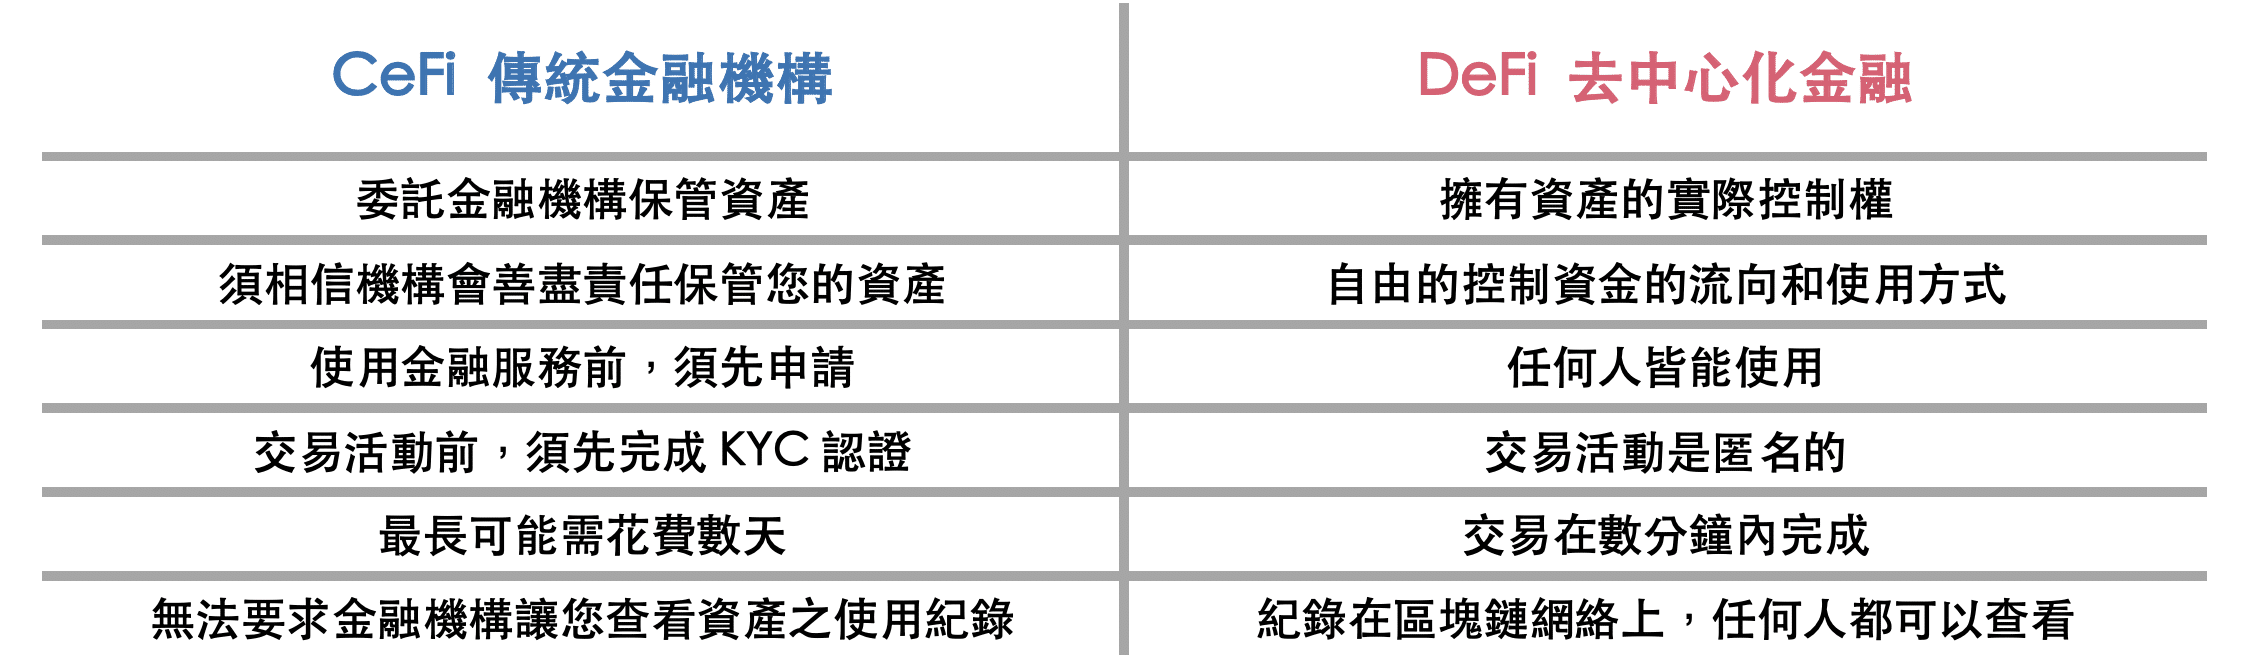 Defi介紹